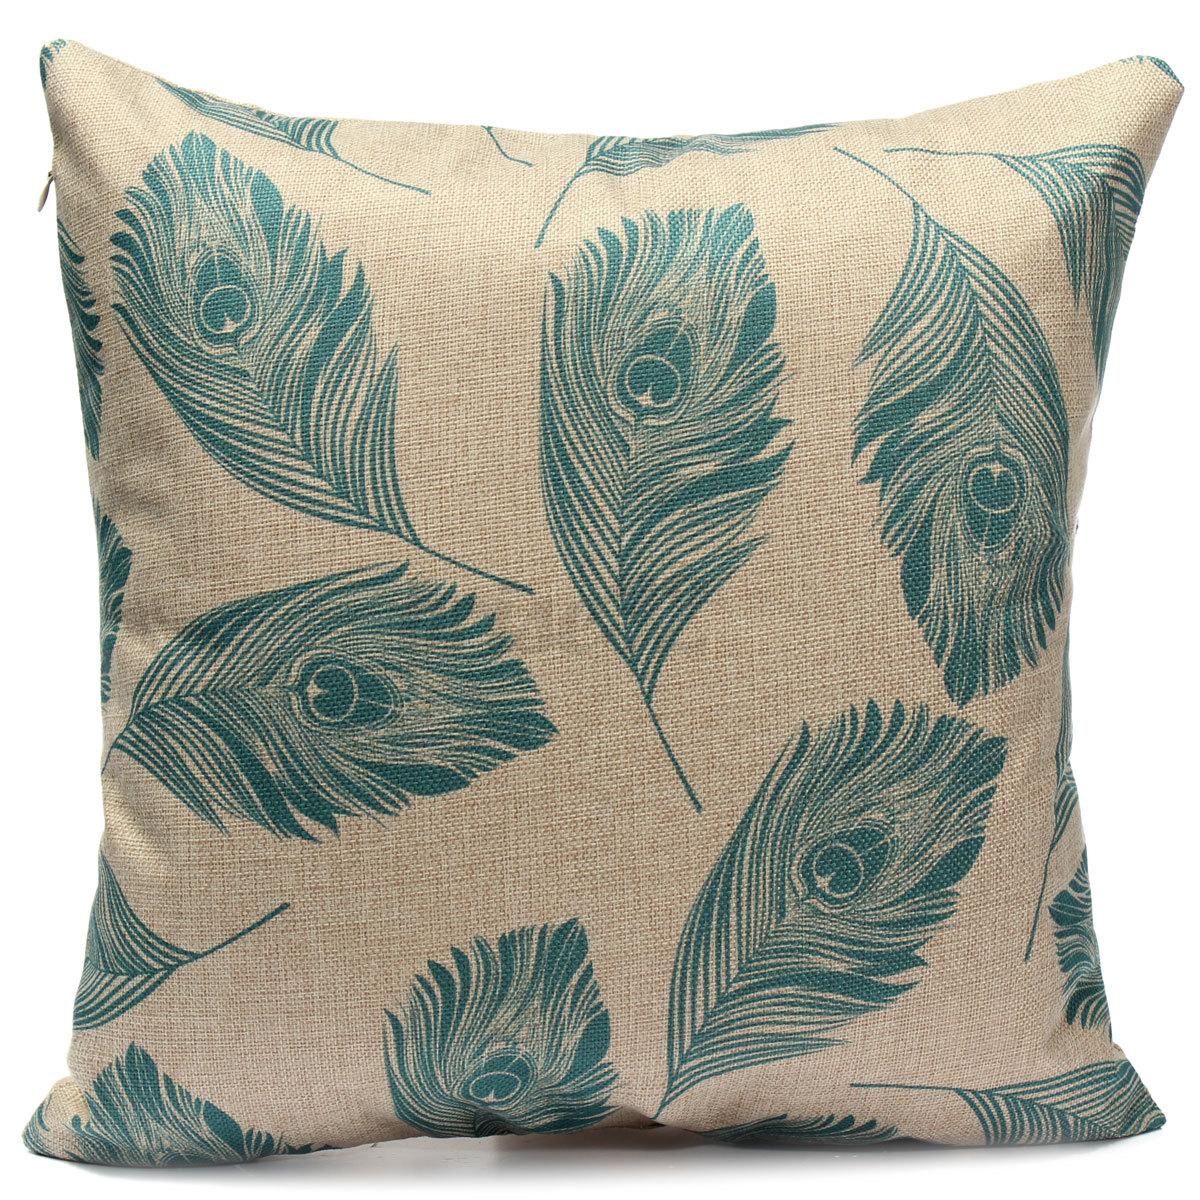 Lavender Throw Pillows : Leaves Feather Linen Cotton Cushion Cover Throw Pillow Case Home Sofa Car Decor eBay